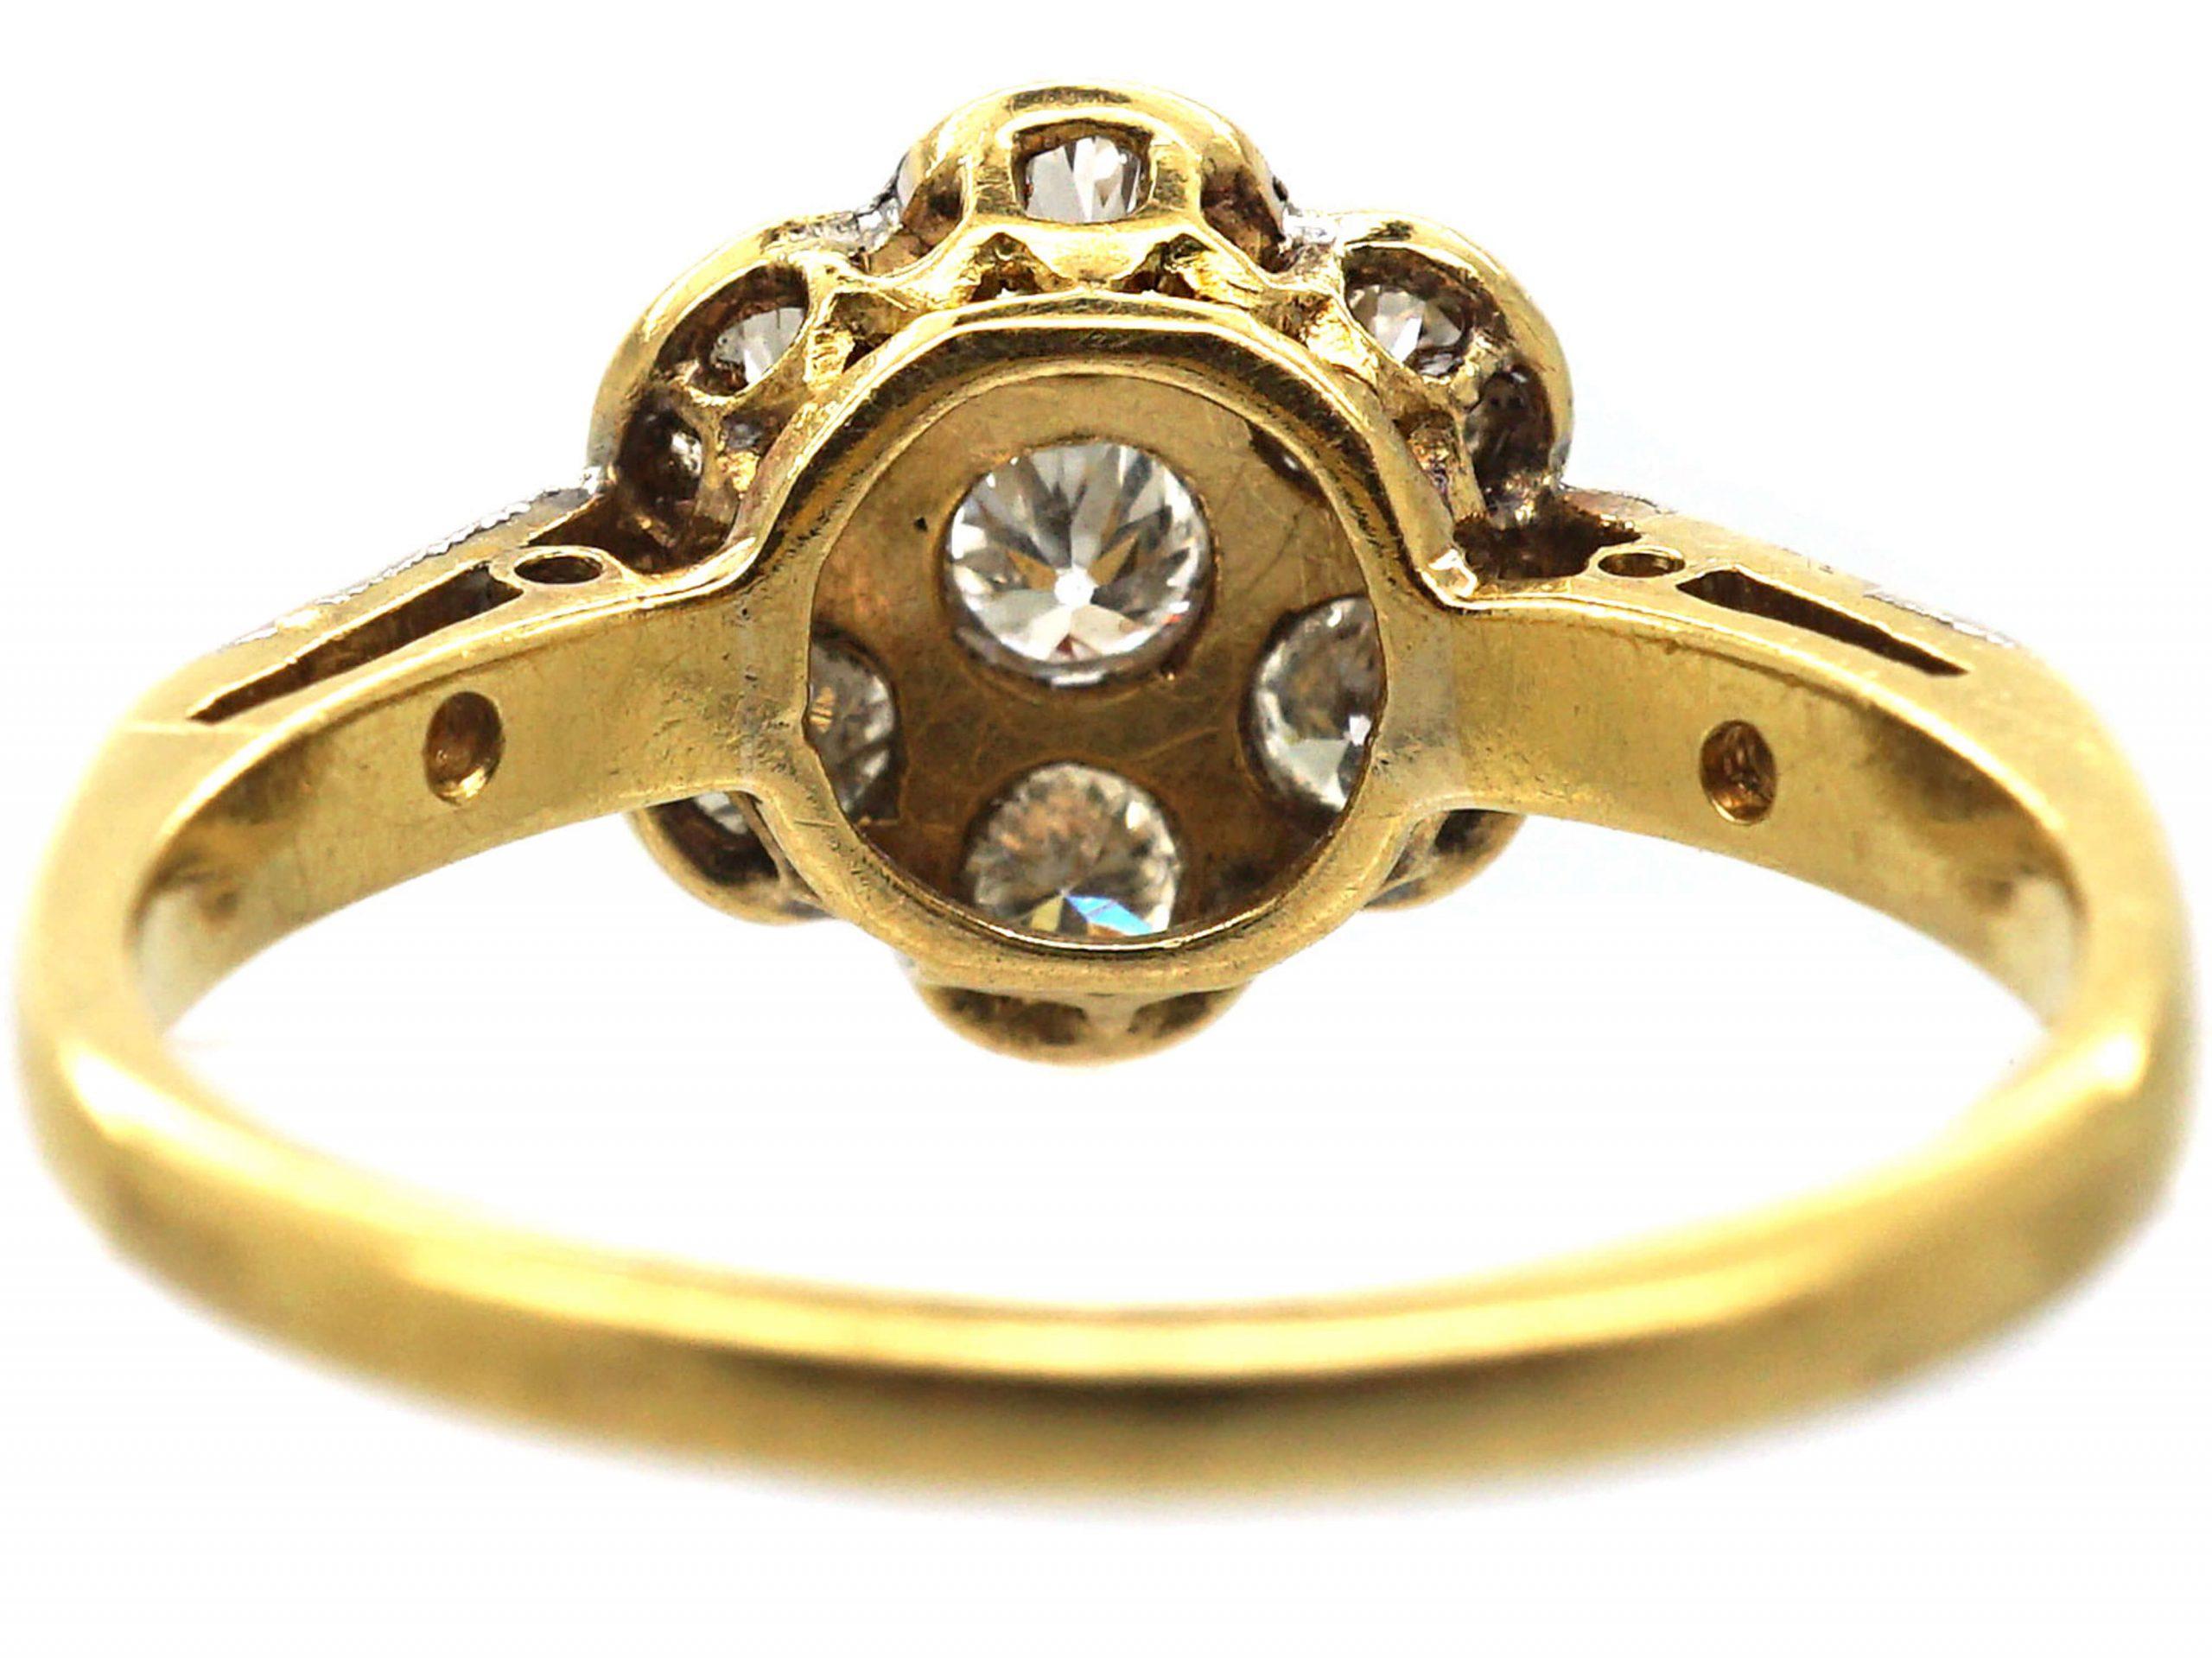 Edwardian 18ct Gold & Platinum, Diamond Cluster Ring with Diamond Set Shoulders